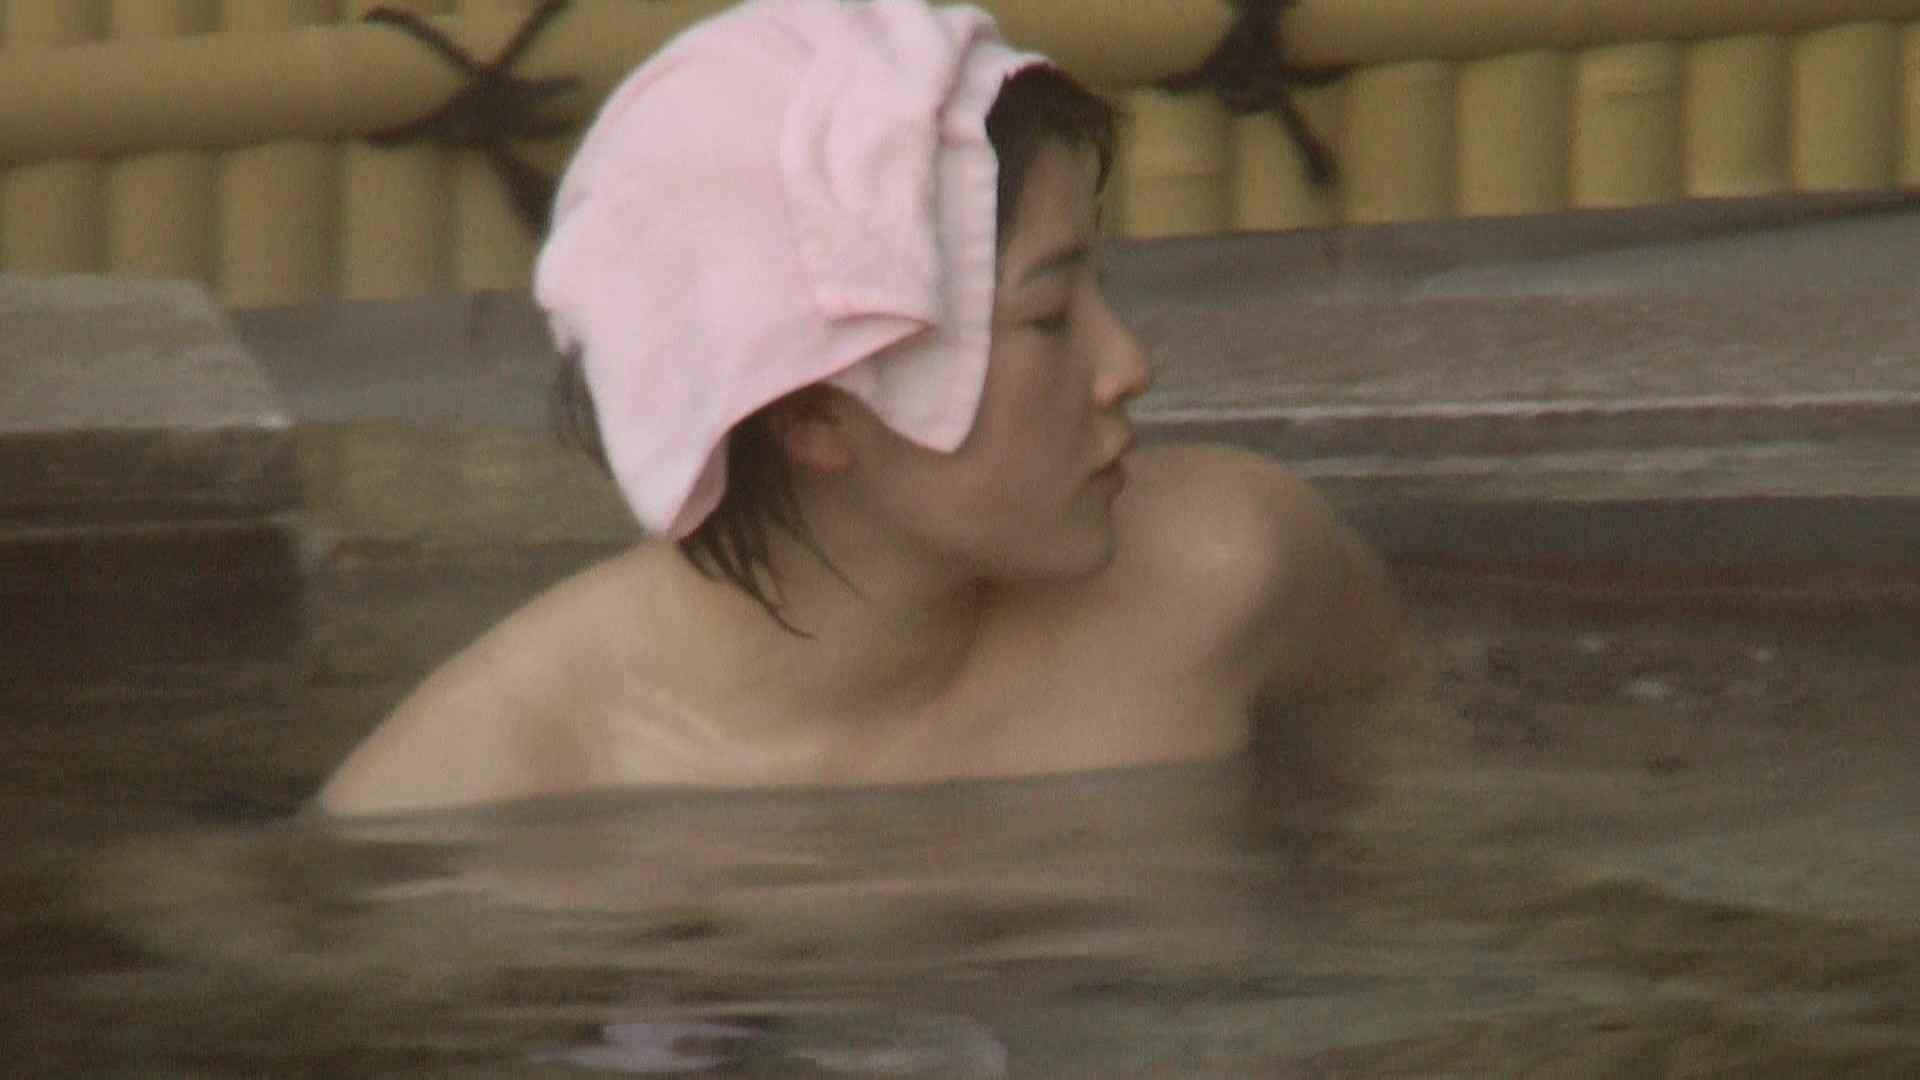 Aquaな露天風呂Vol.207 OLのエロ生活 | 露天風呂  98連発 88